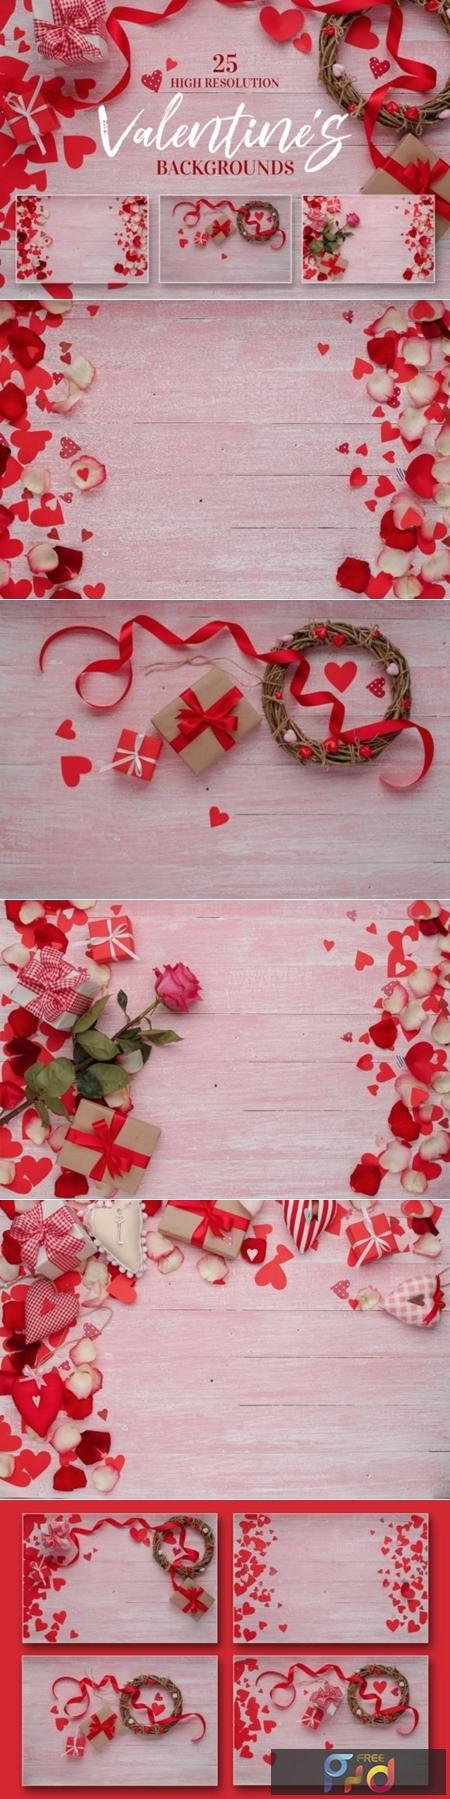 Valentines Day Love Celebration 2007508 1